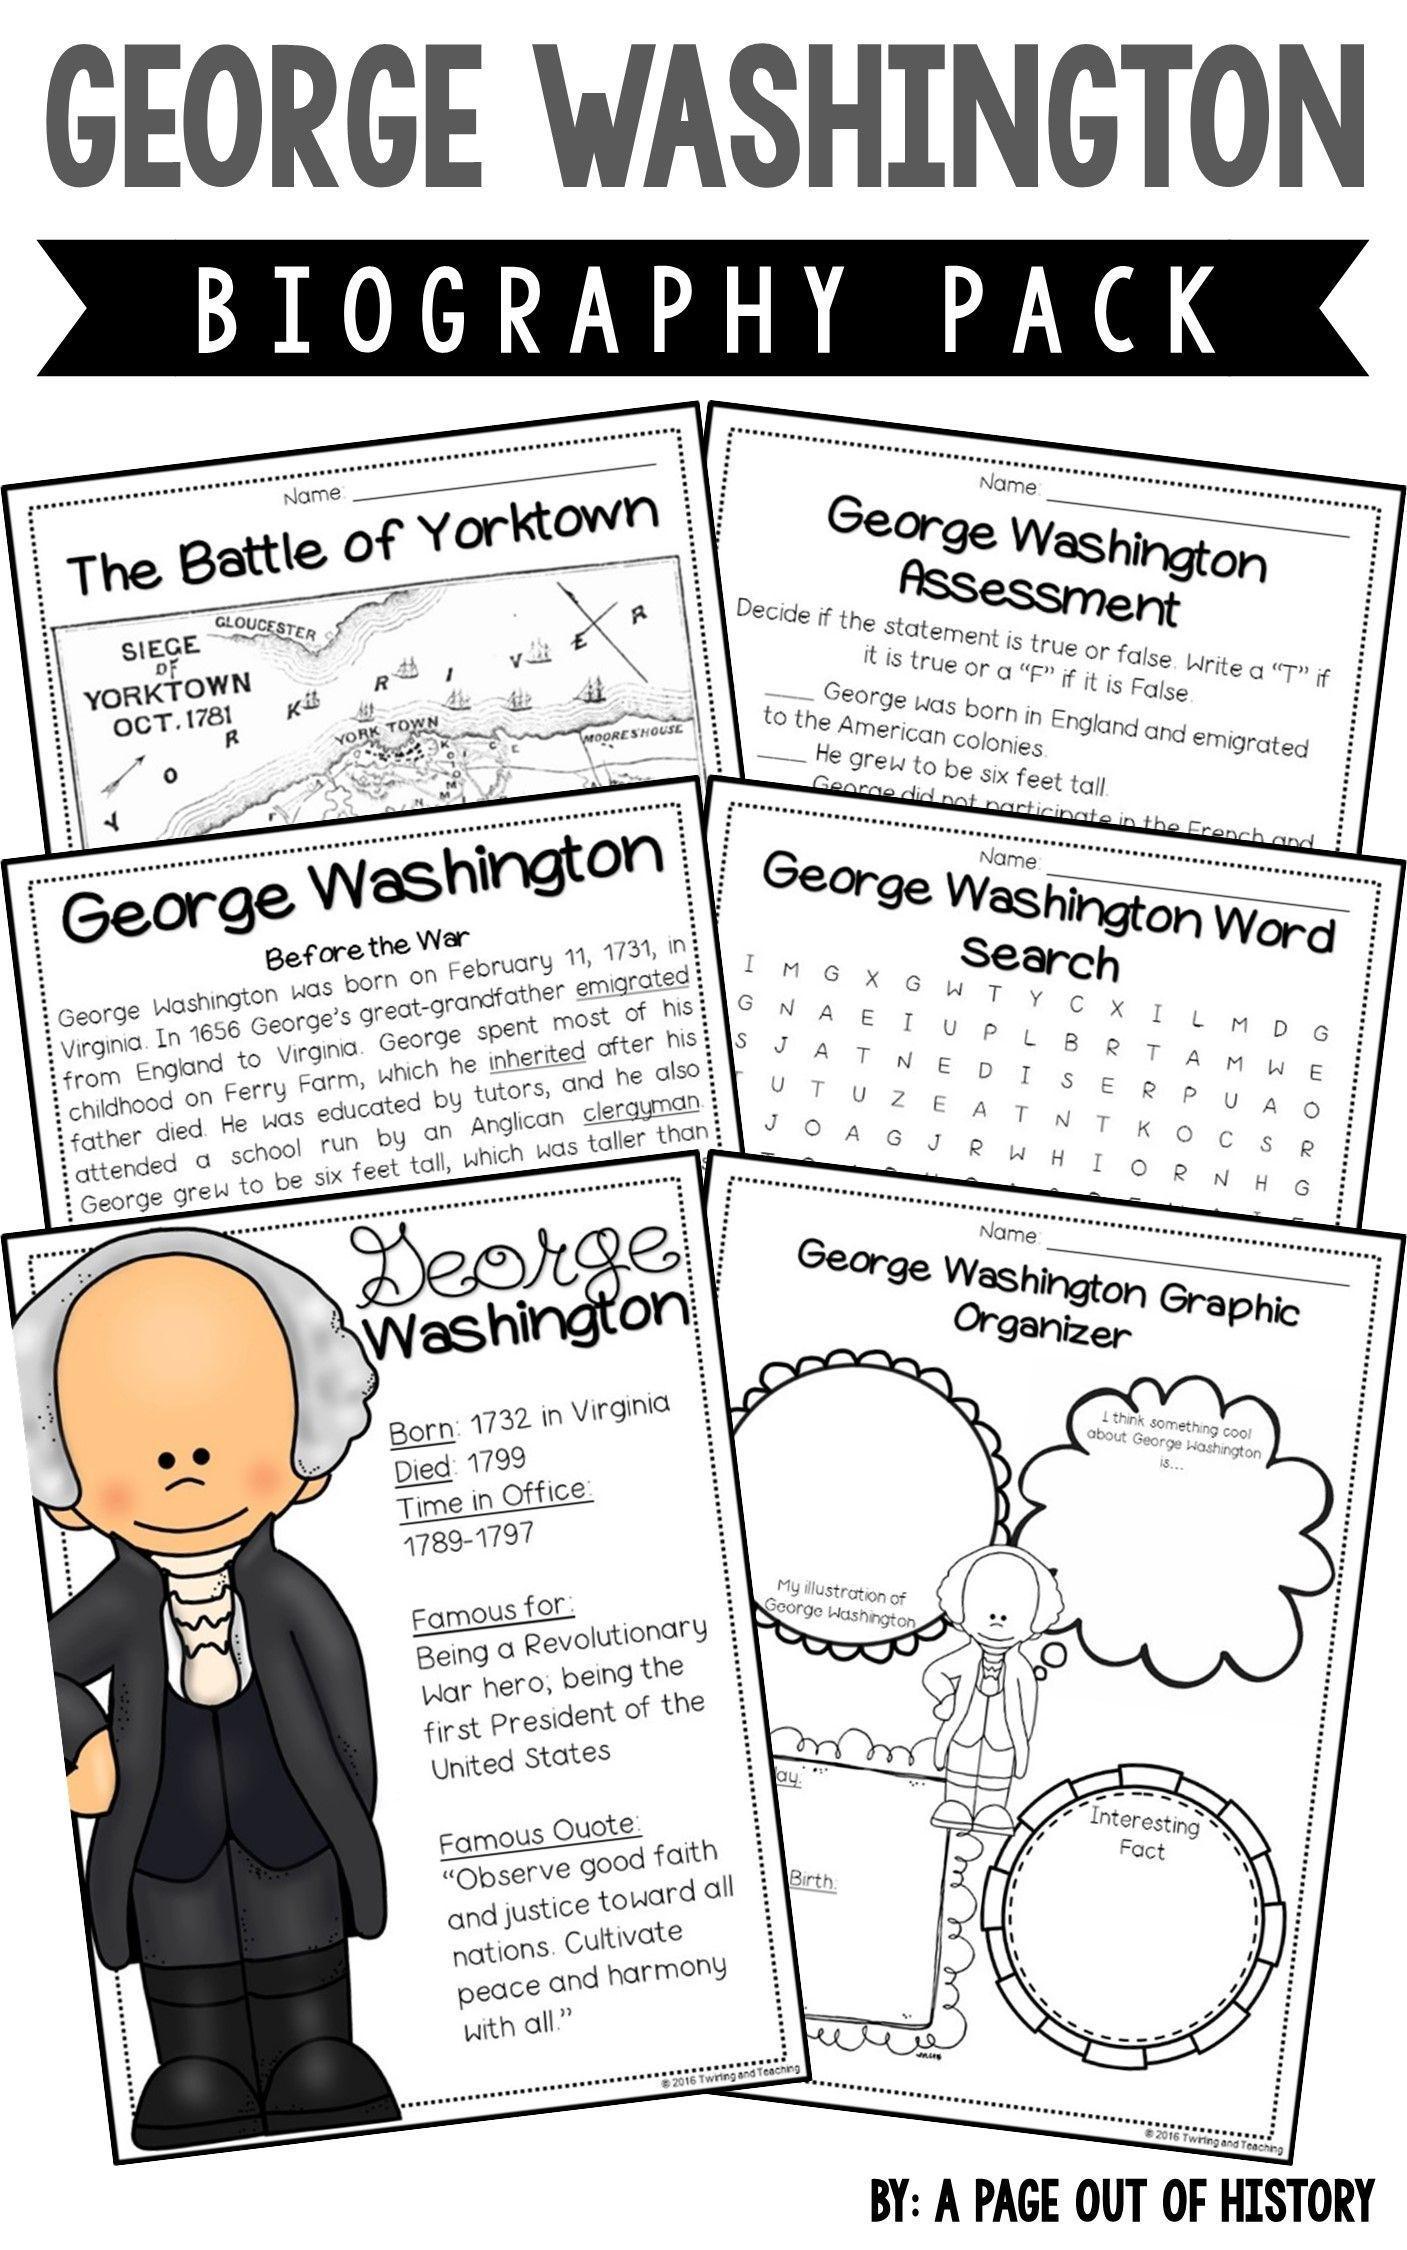 George Washington Biography Pack U S Presidents In